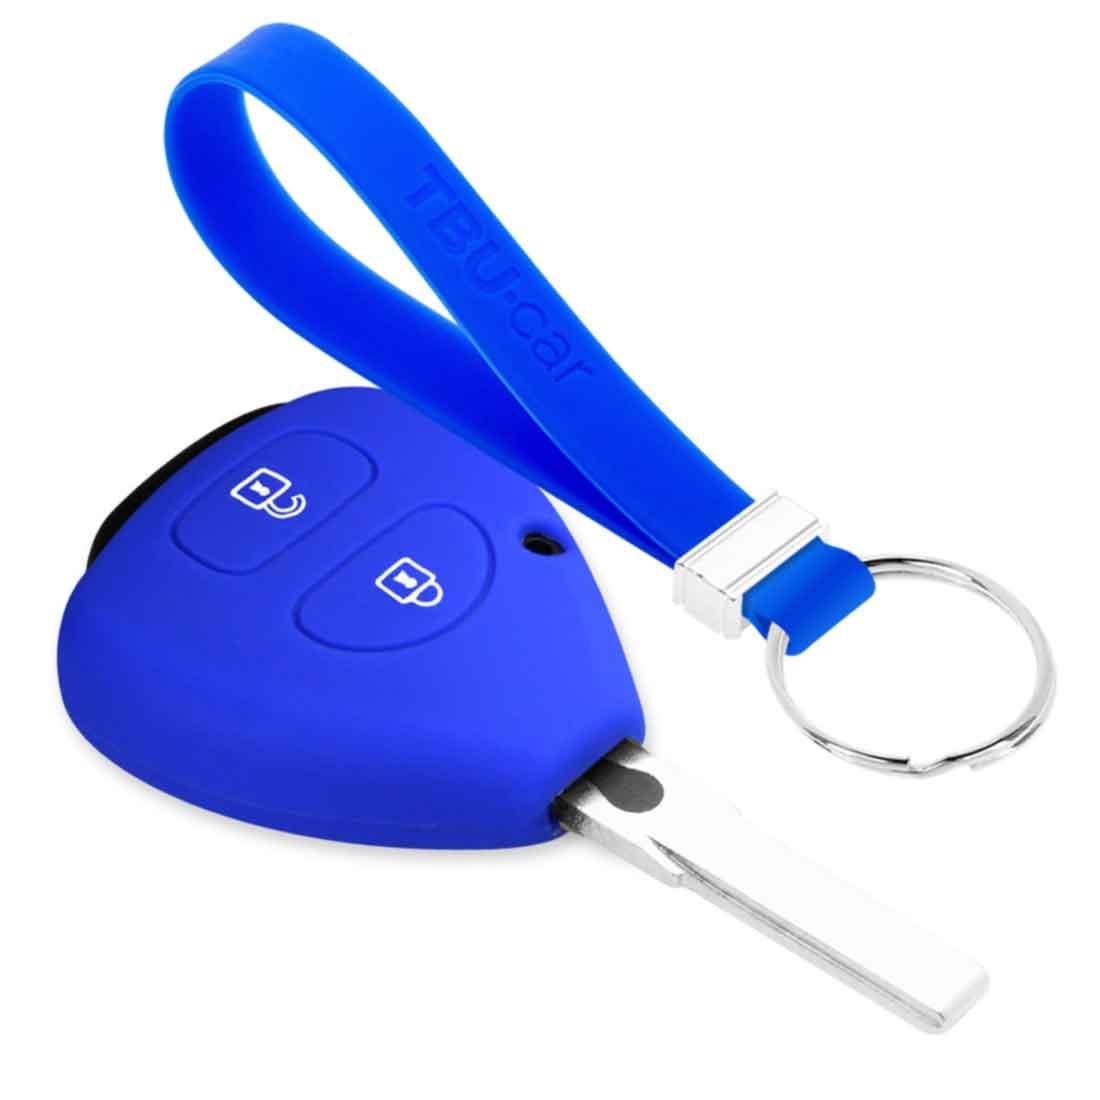 TBU car TBU car Sleutel cover compatibel met Toyota - Silicone sleutelhoesje - beschermhoesje autosleutel - Blauw